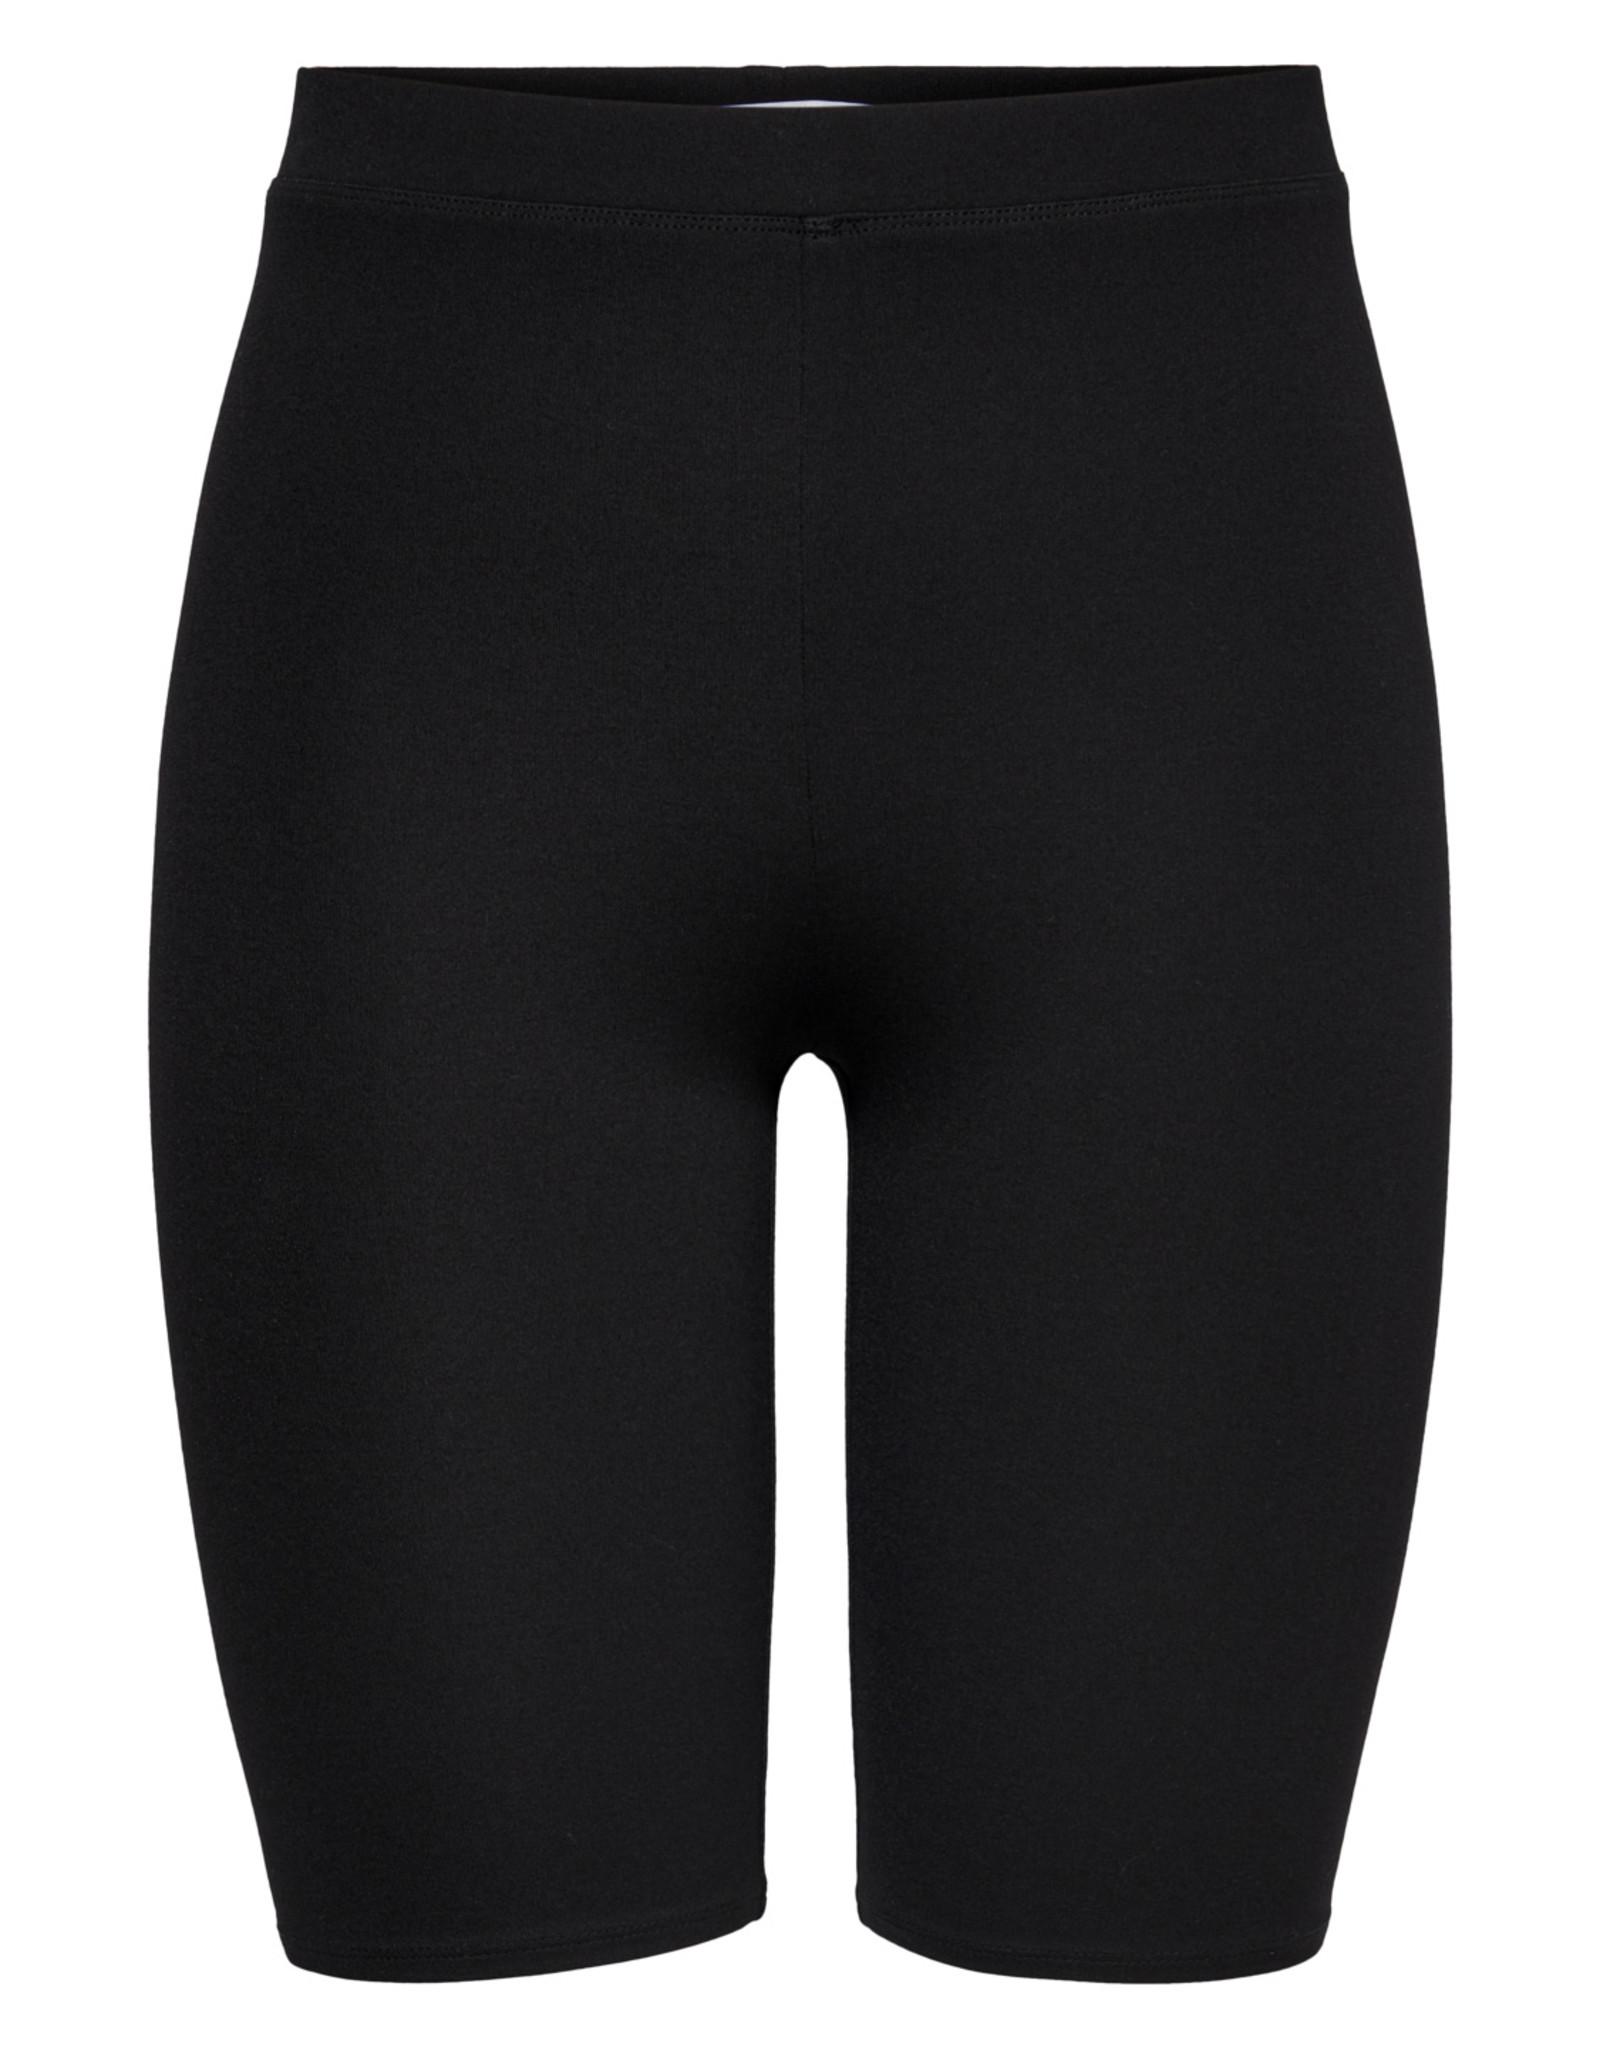 Only Sila Bike Shorts